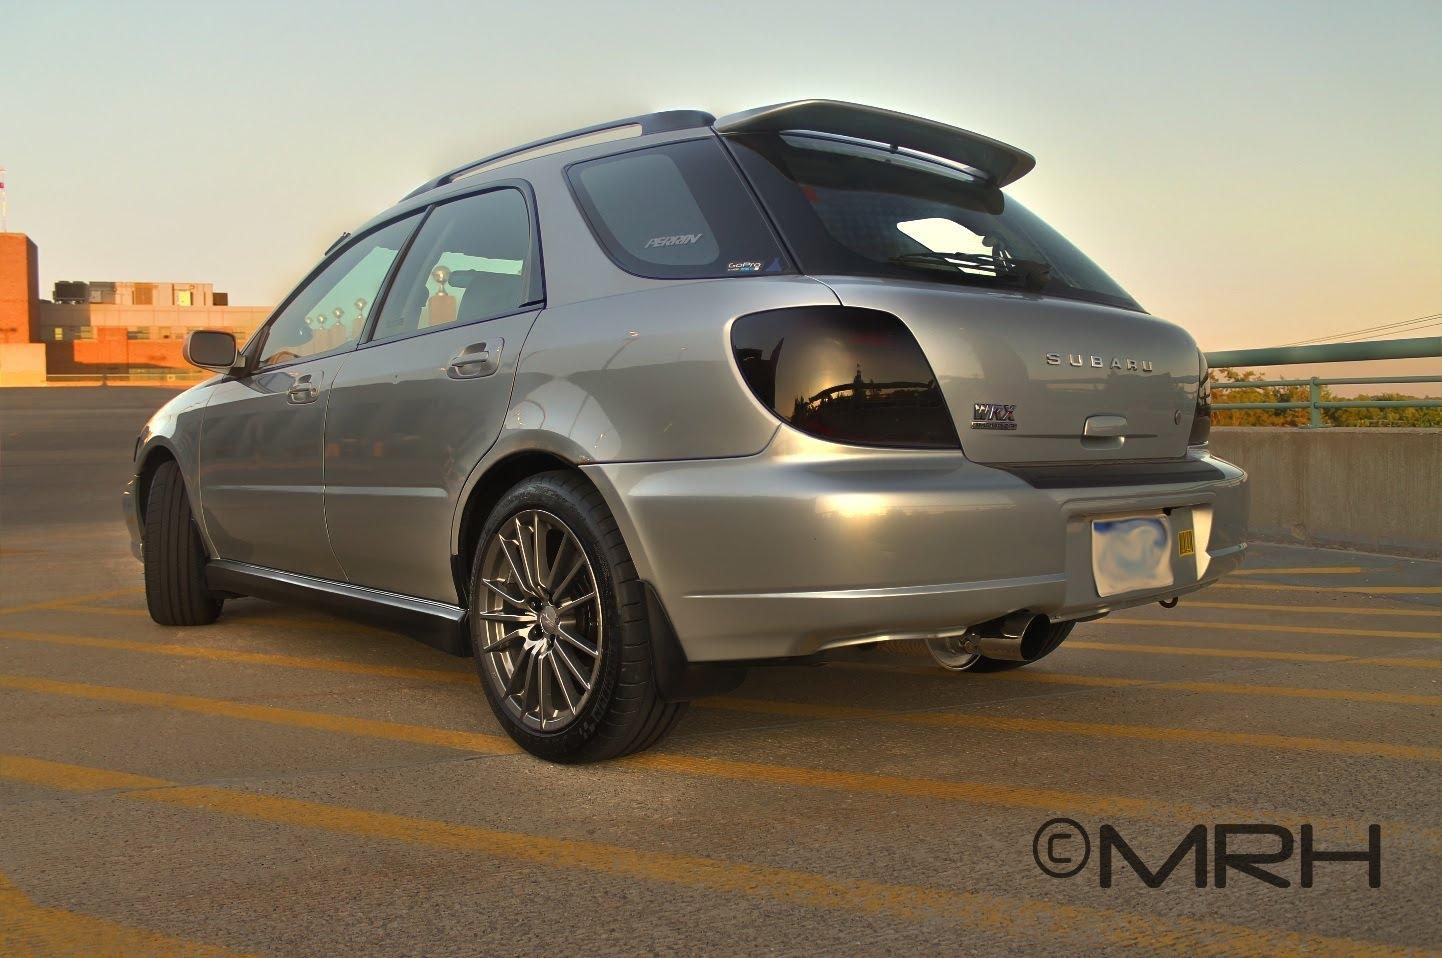 DIY: Subaru Impreza WRX Power Steering Fluid Change